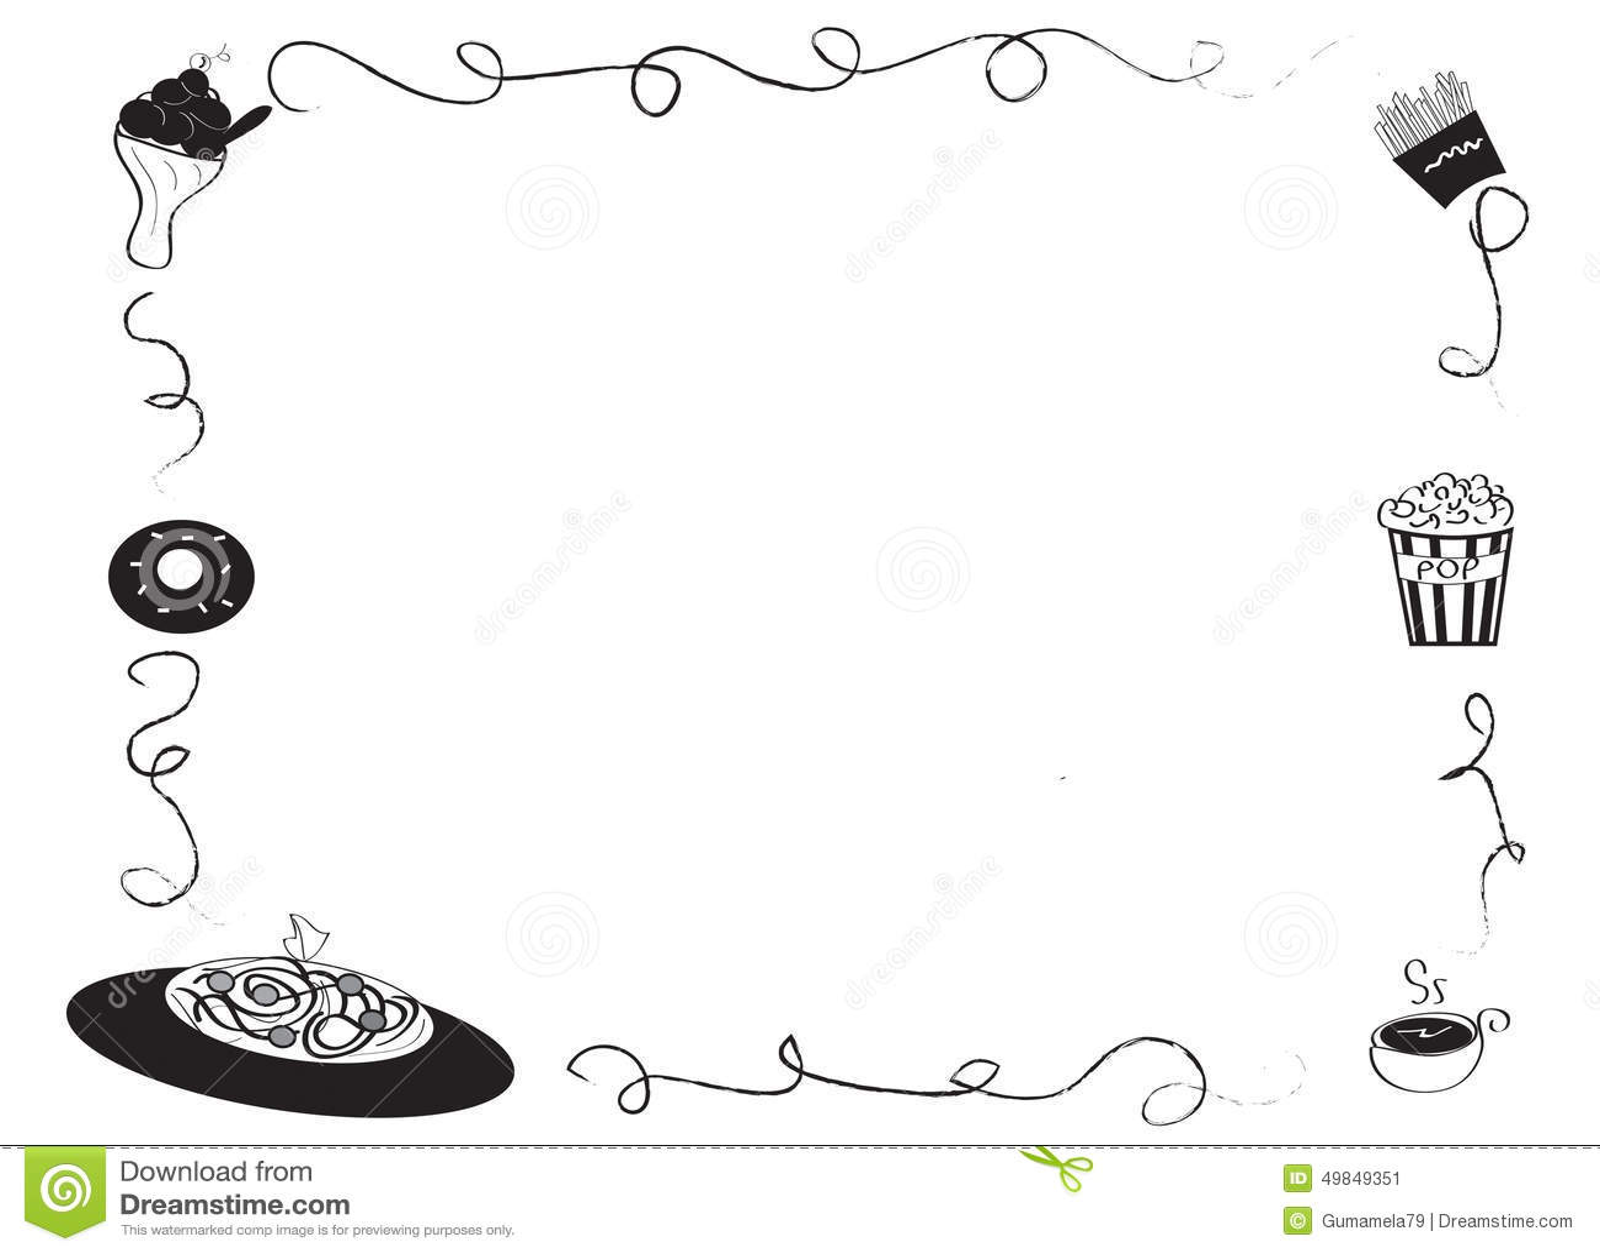 Decorative frames set download free vector art stock graphics - Decorative Frame Border With Food Stock Illustration